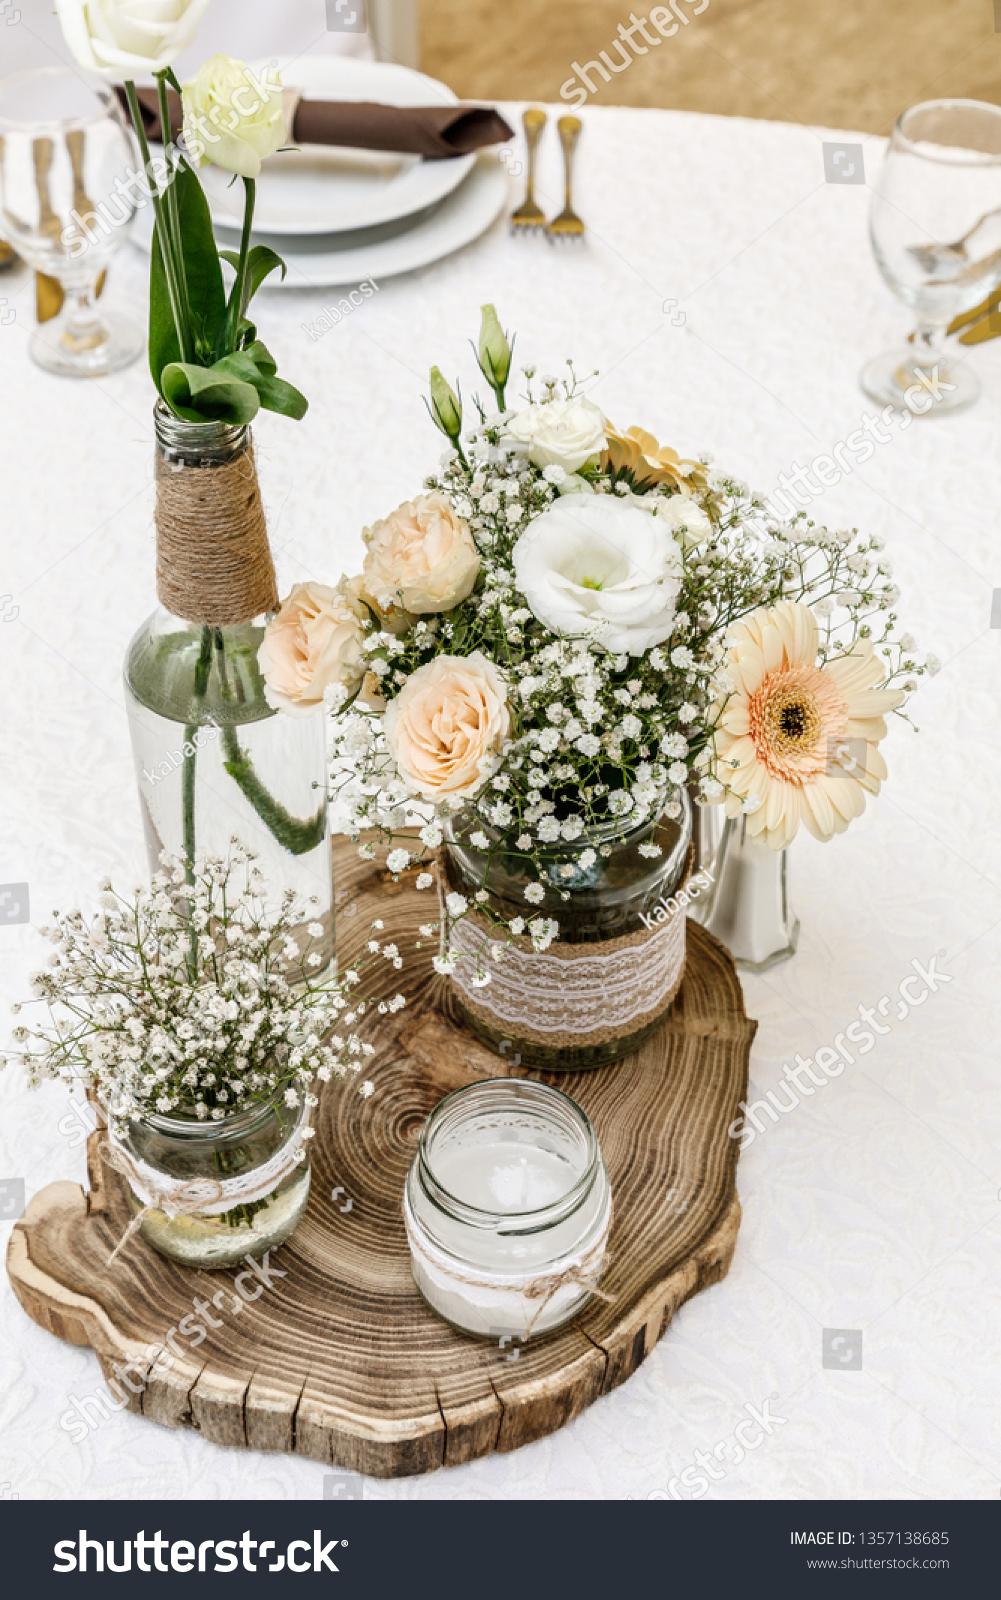 Elegant Vintage Wedding Table Decor Stock Photo (Edit Now) 1357138685